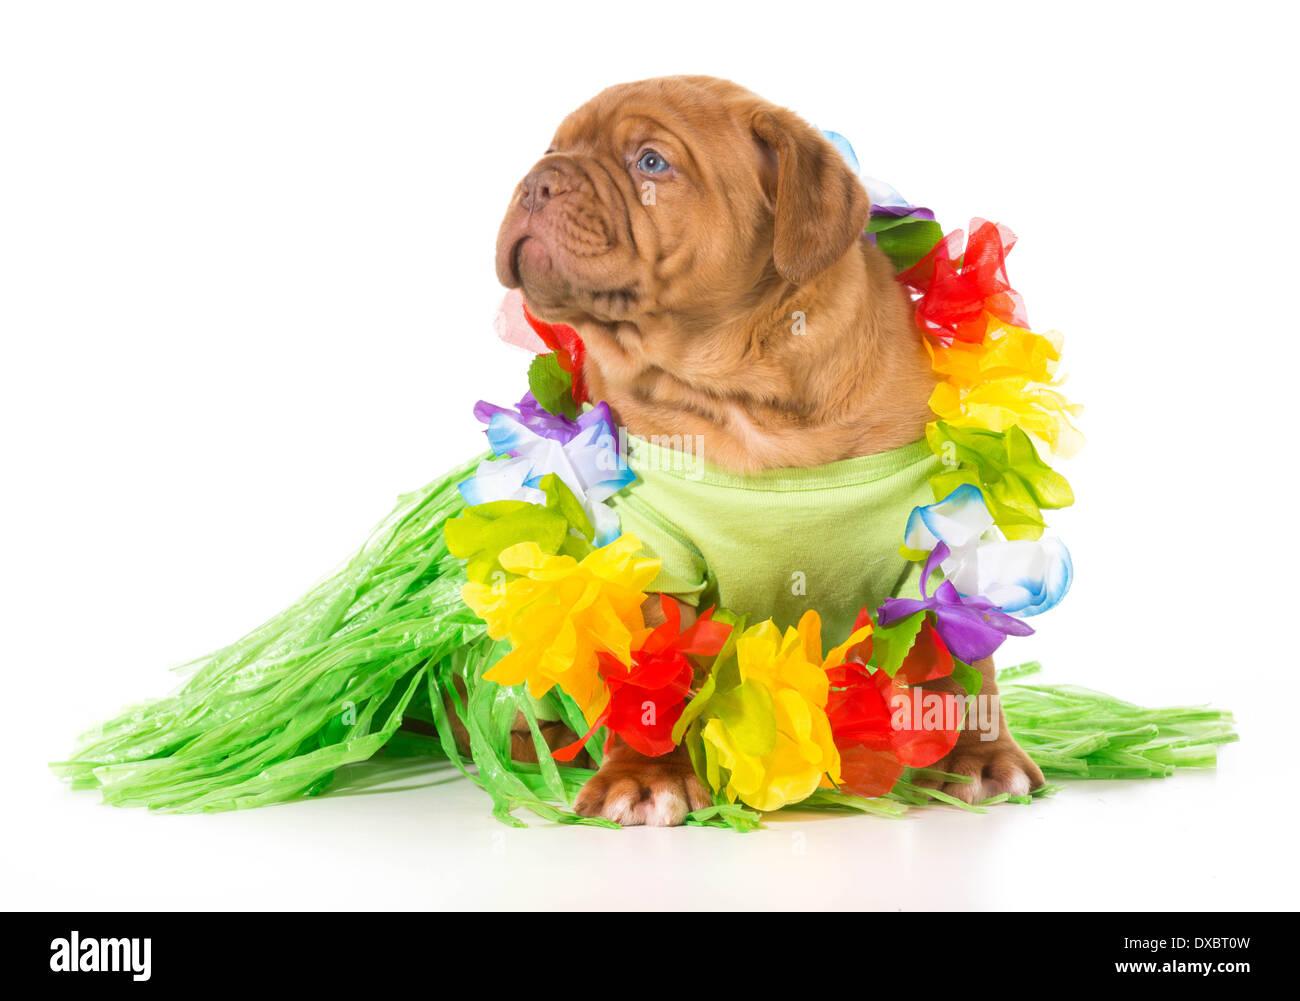 hula dog - dogue de bordeaux wearing grass skirt and lei - Stock Image